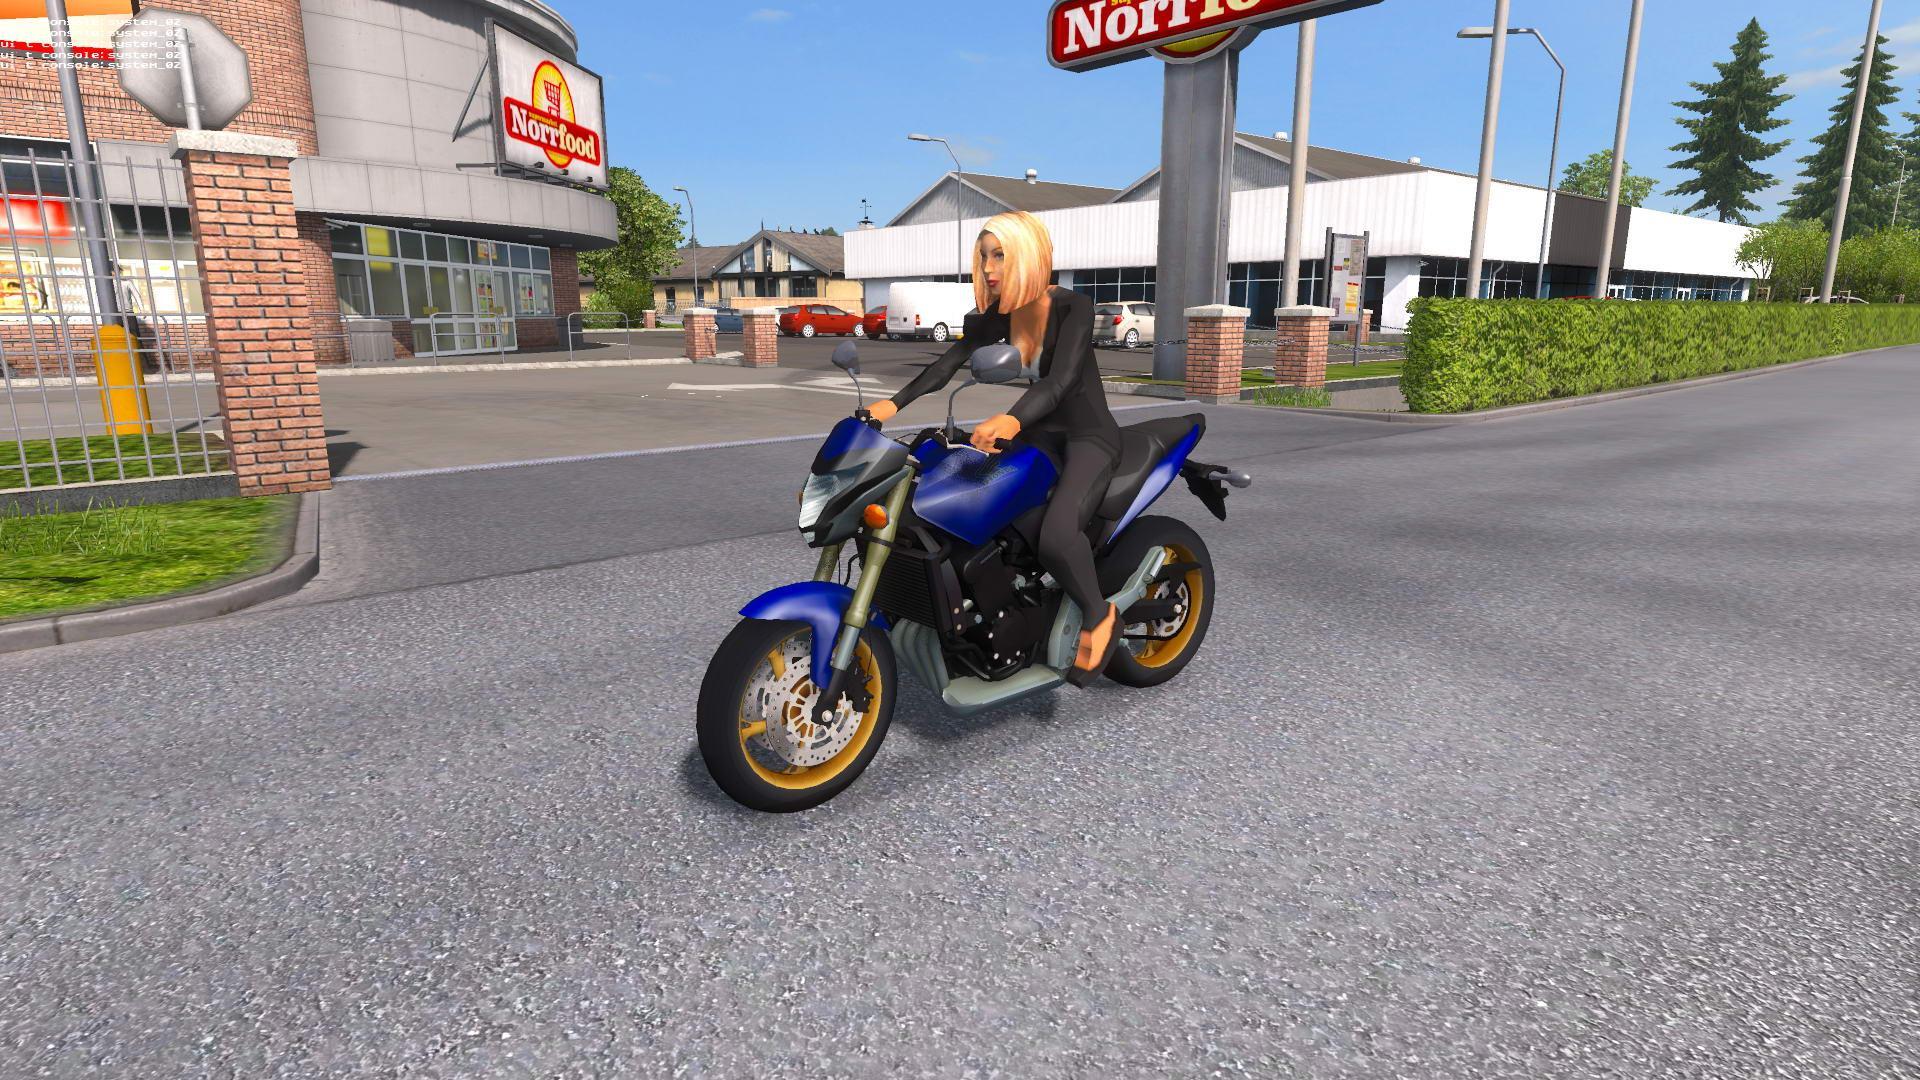 honda-cb600-hornet-ai-traffic-motorcycle_1